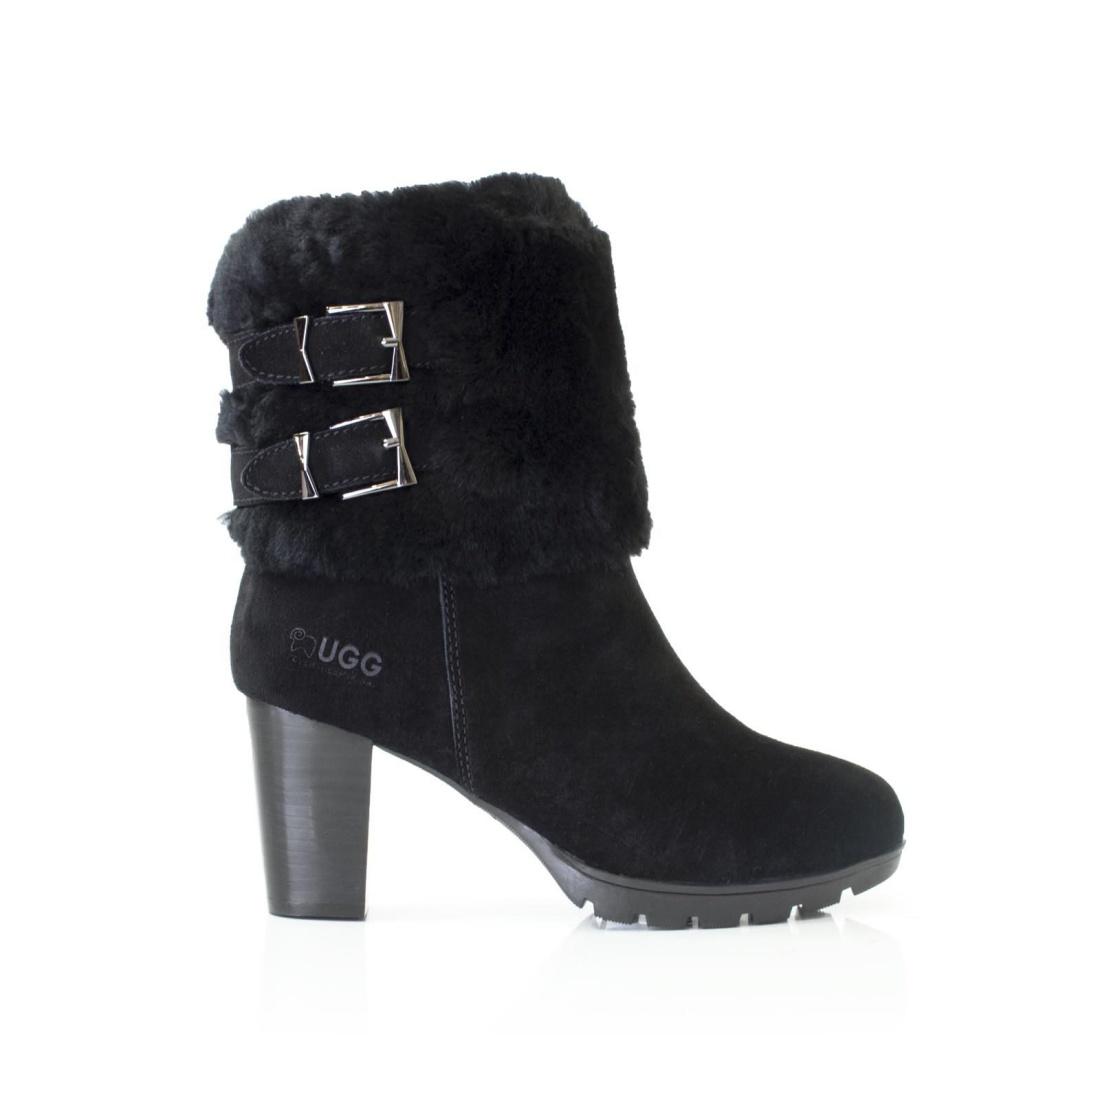 UGG High Heel Boots - Black - AU Women 8 / Men 6